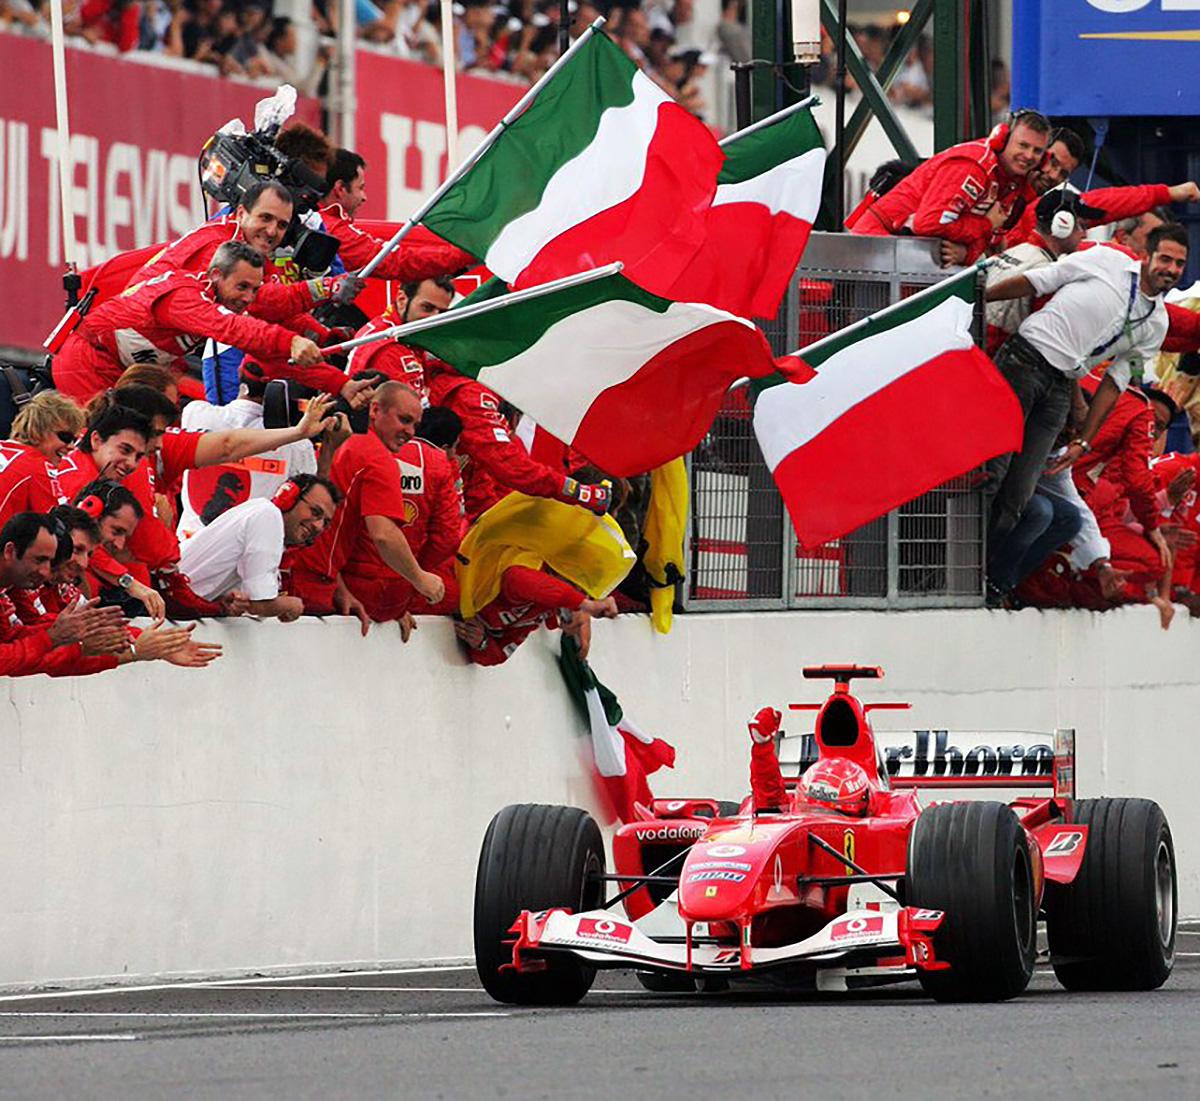 2004 Michael Schumacher Japanese Grand Prix Race Winning Ferrari F1 Gloves Racing Hall Of Fame Collection